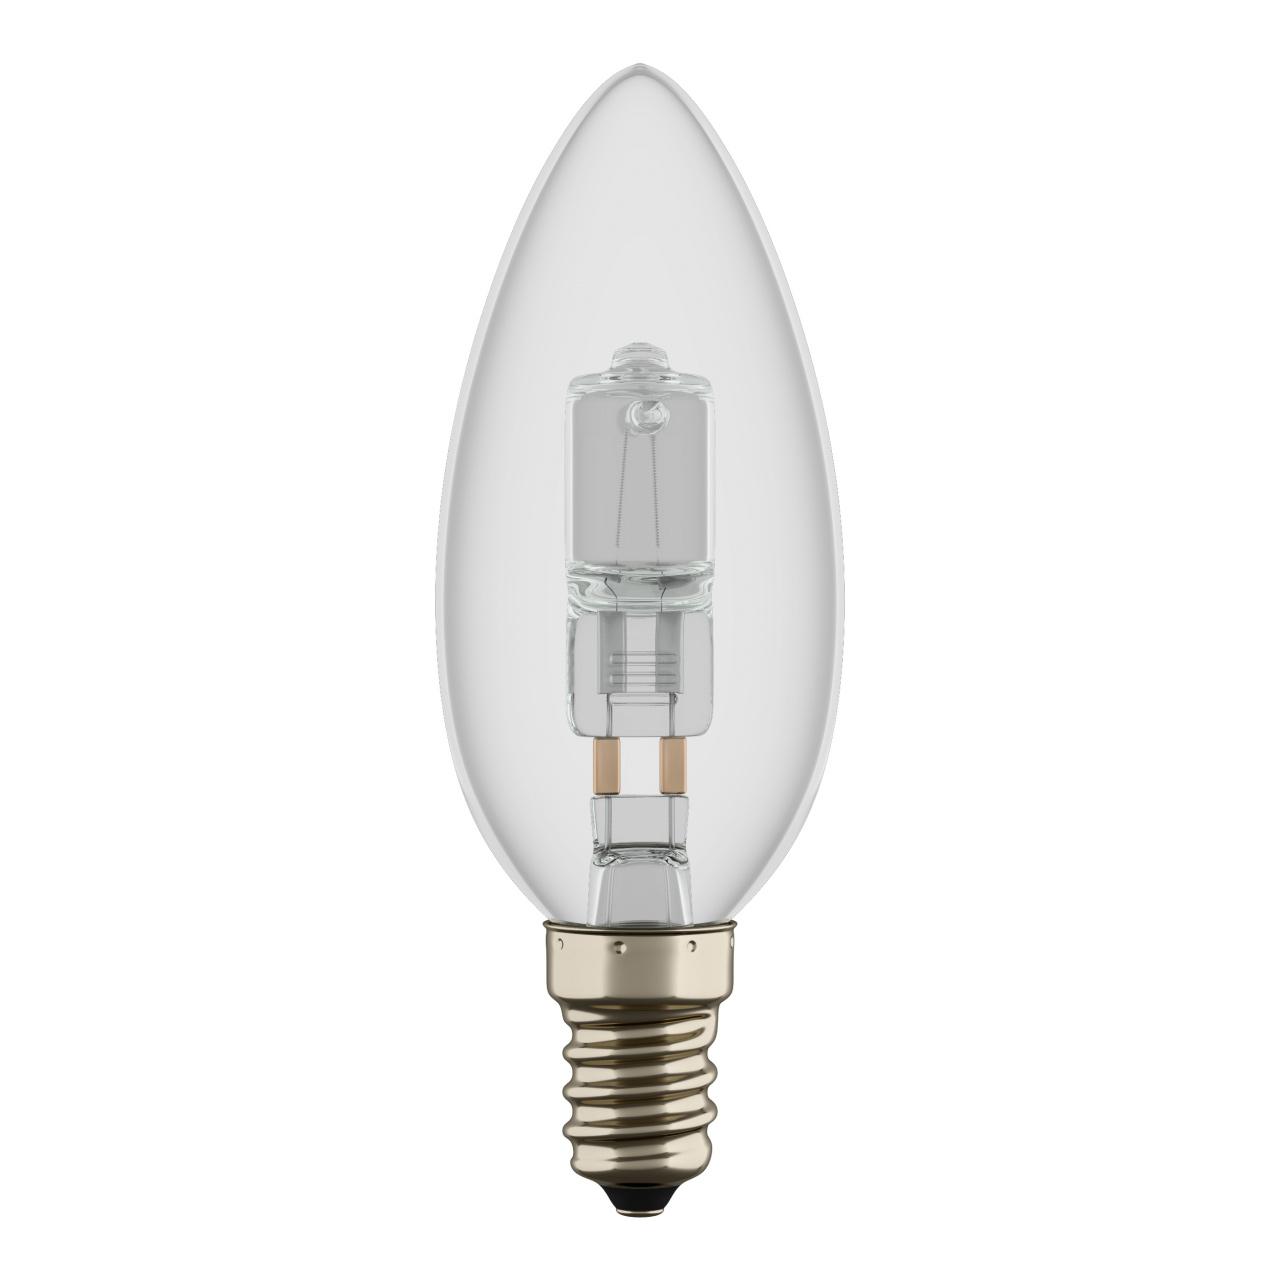 Лампа HAL 220V C35 E14 28W=40W ES RA100 2800K 2000H DIMM Lightstar 922940